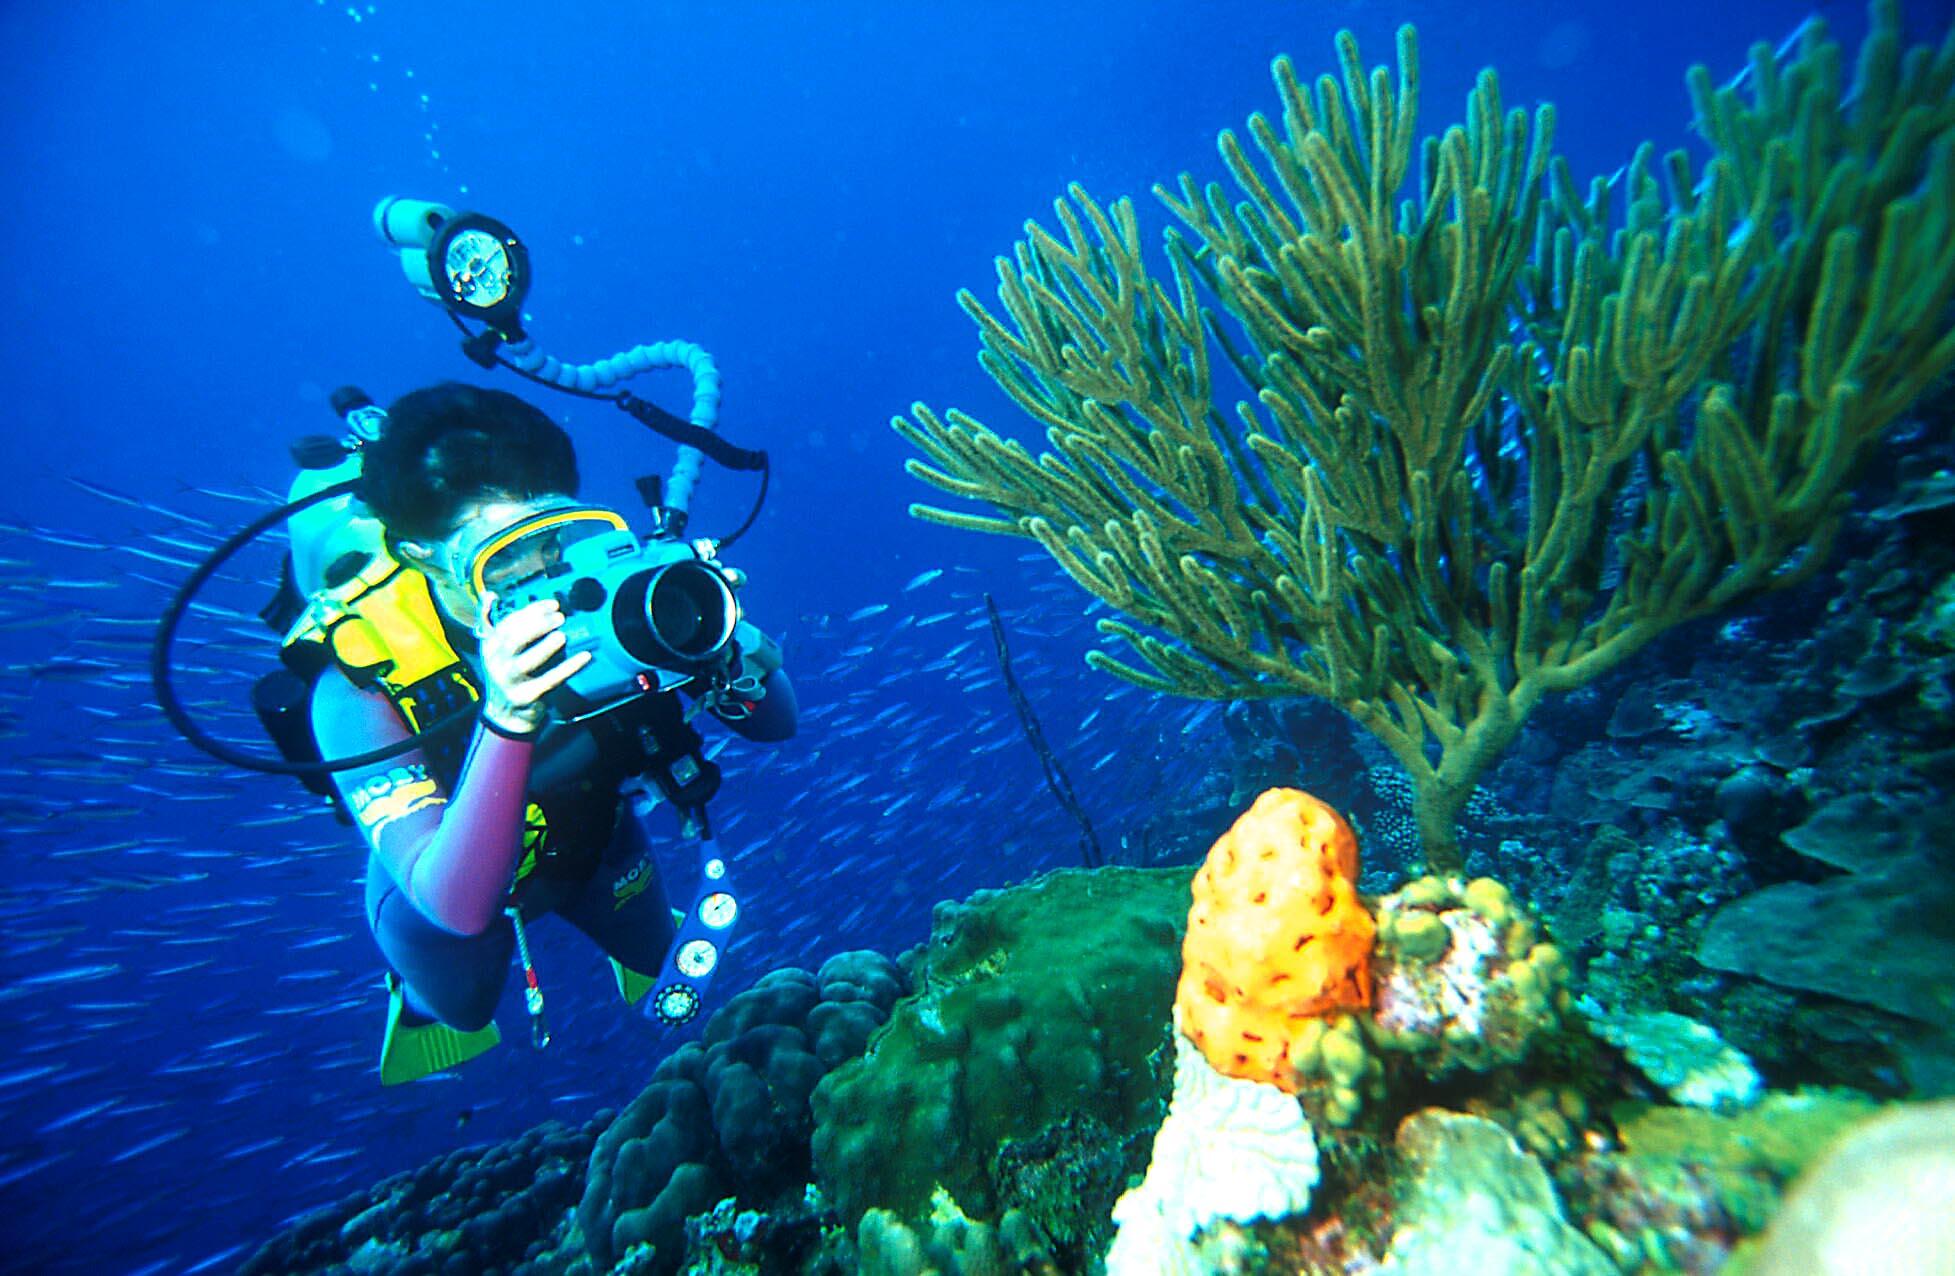 camara de fotografia subacuatica